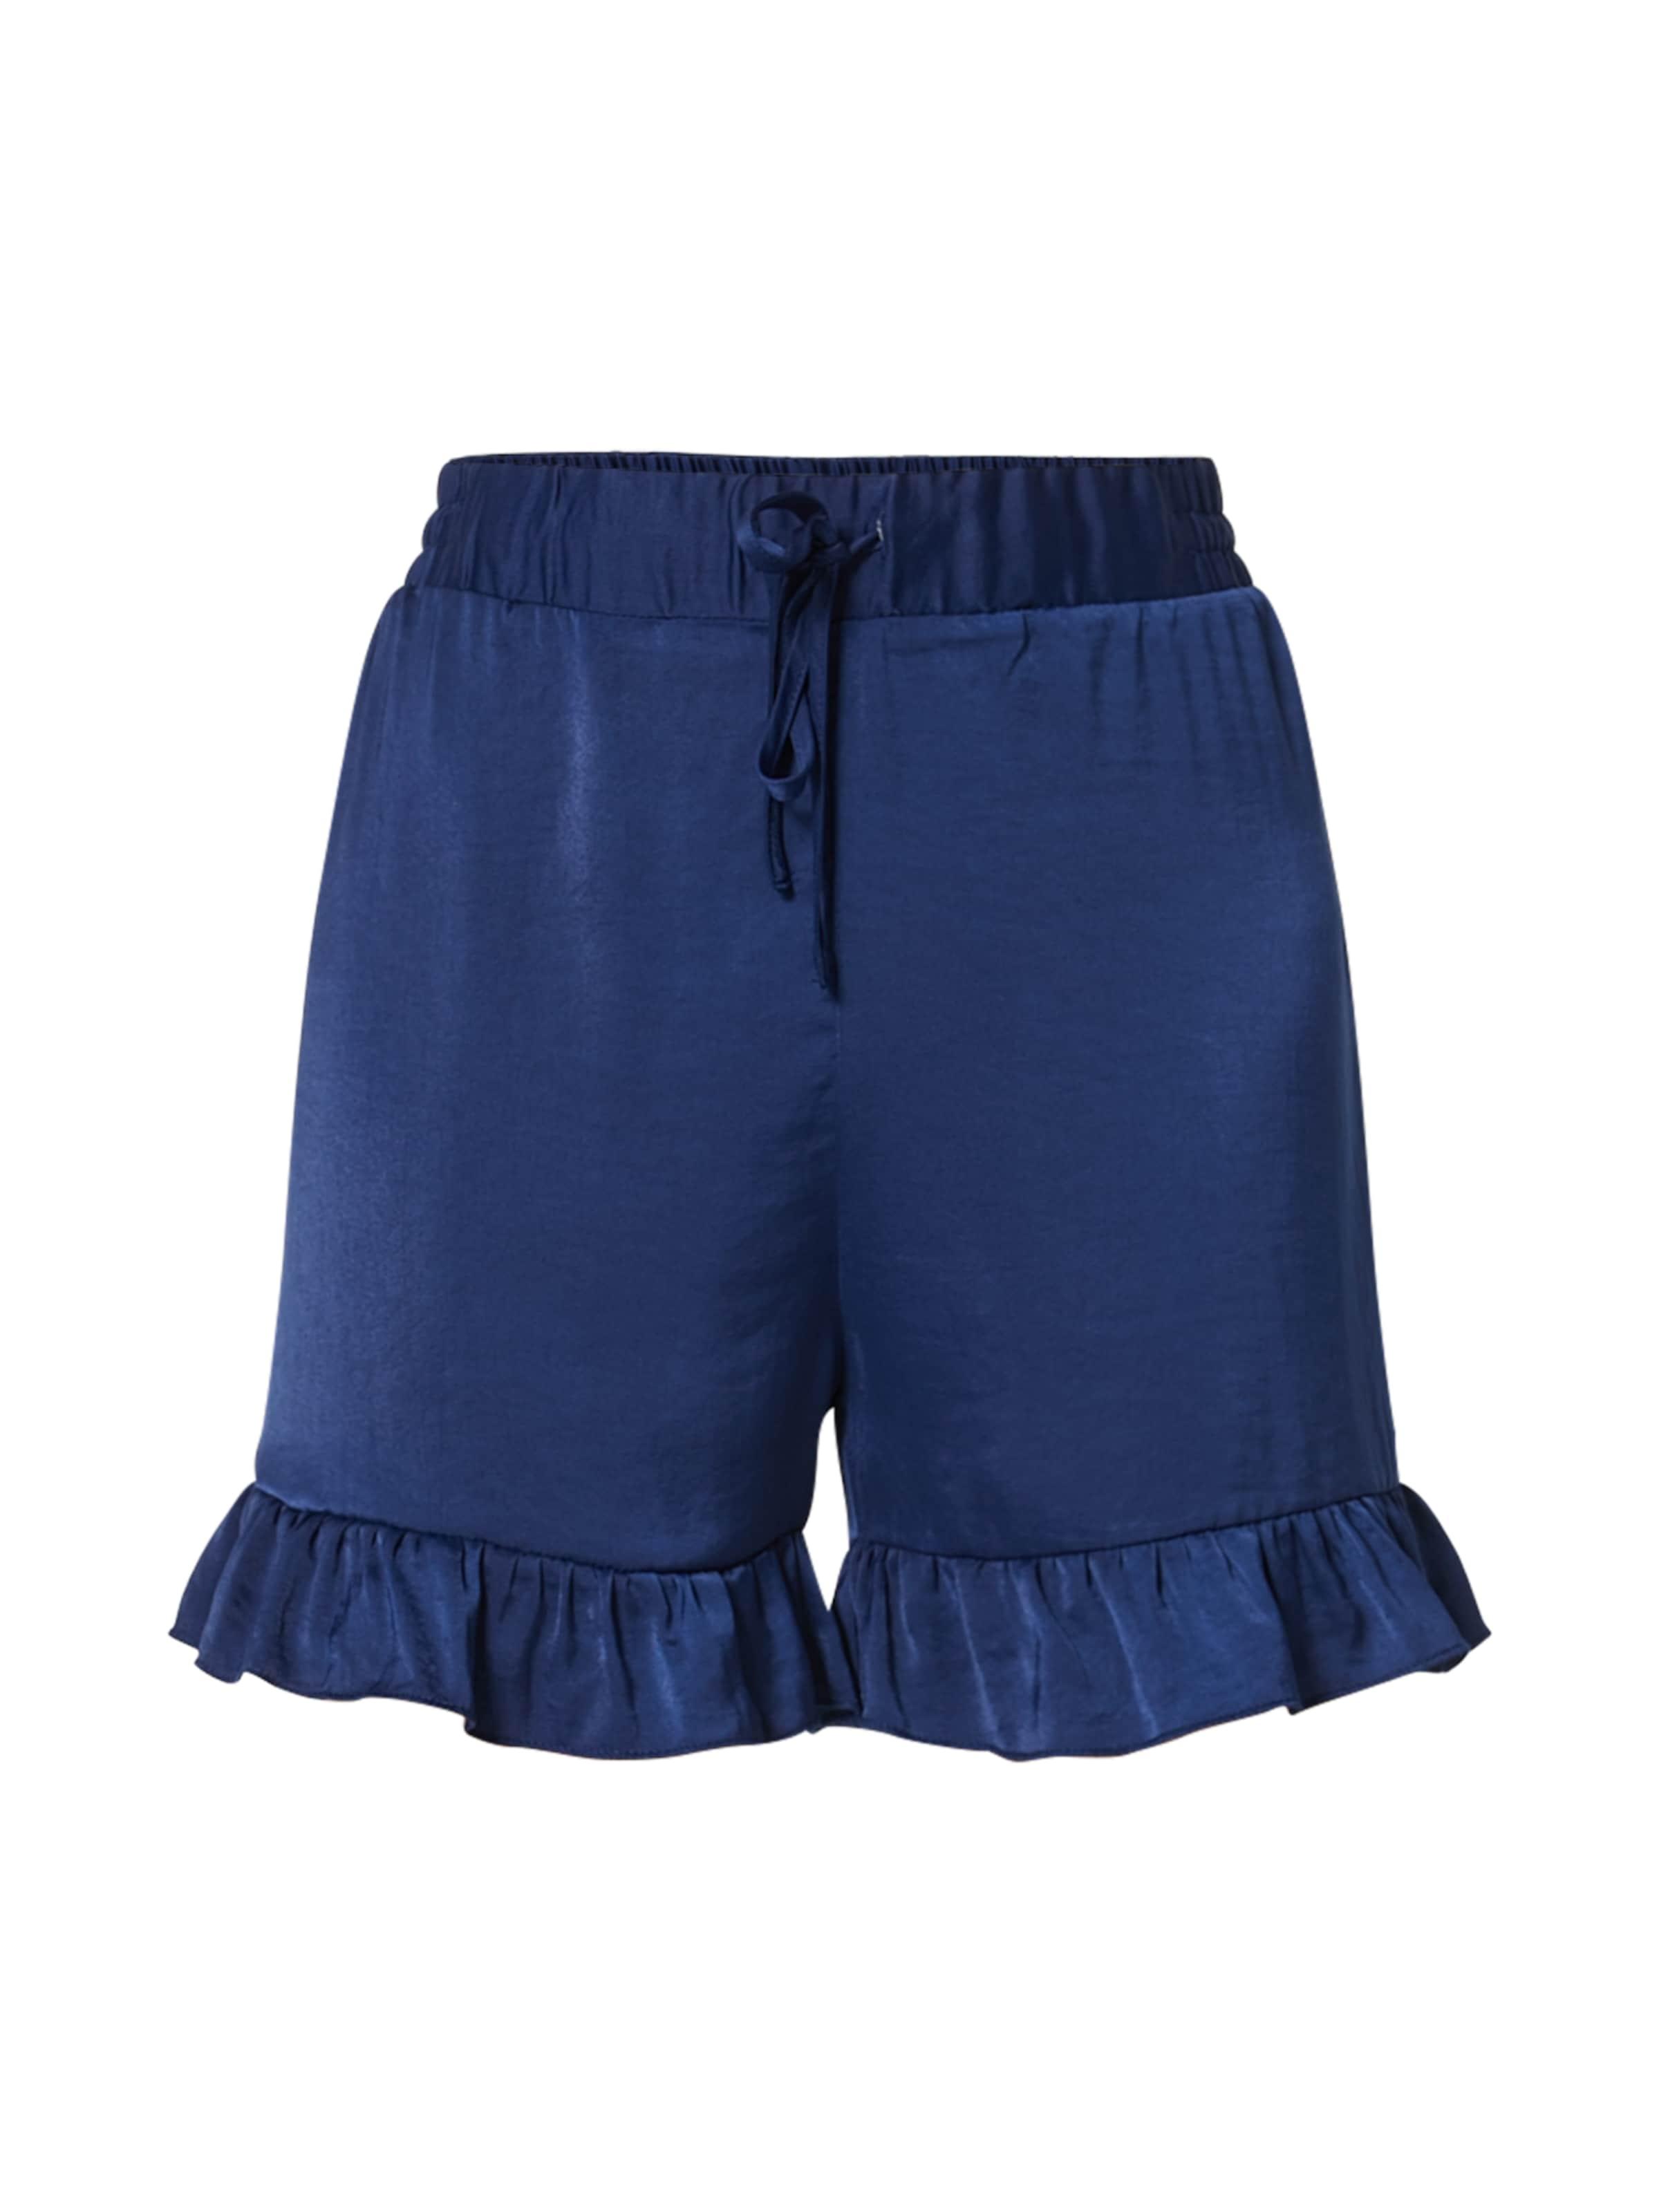 Marine En Pantalon kd Na Bleu T3uFclKJ15